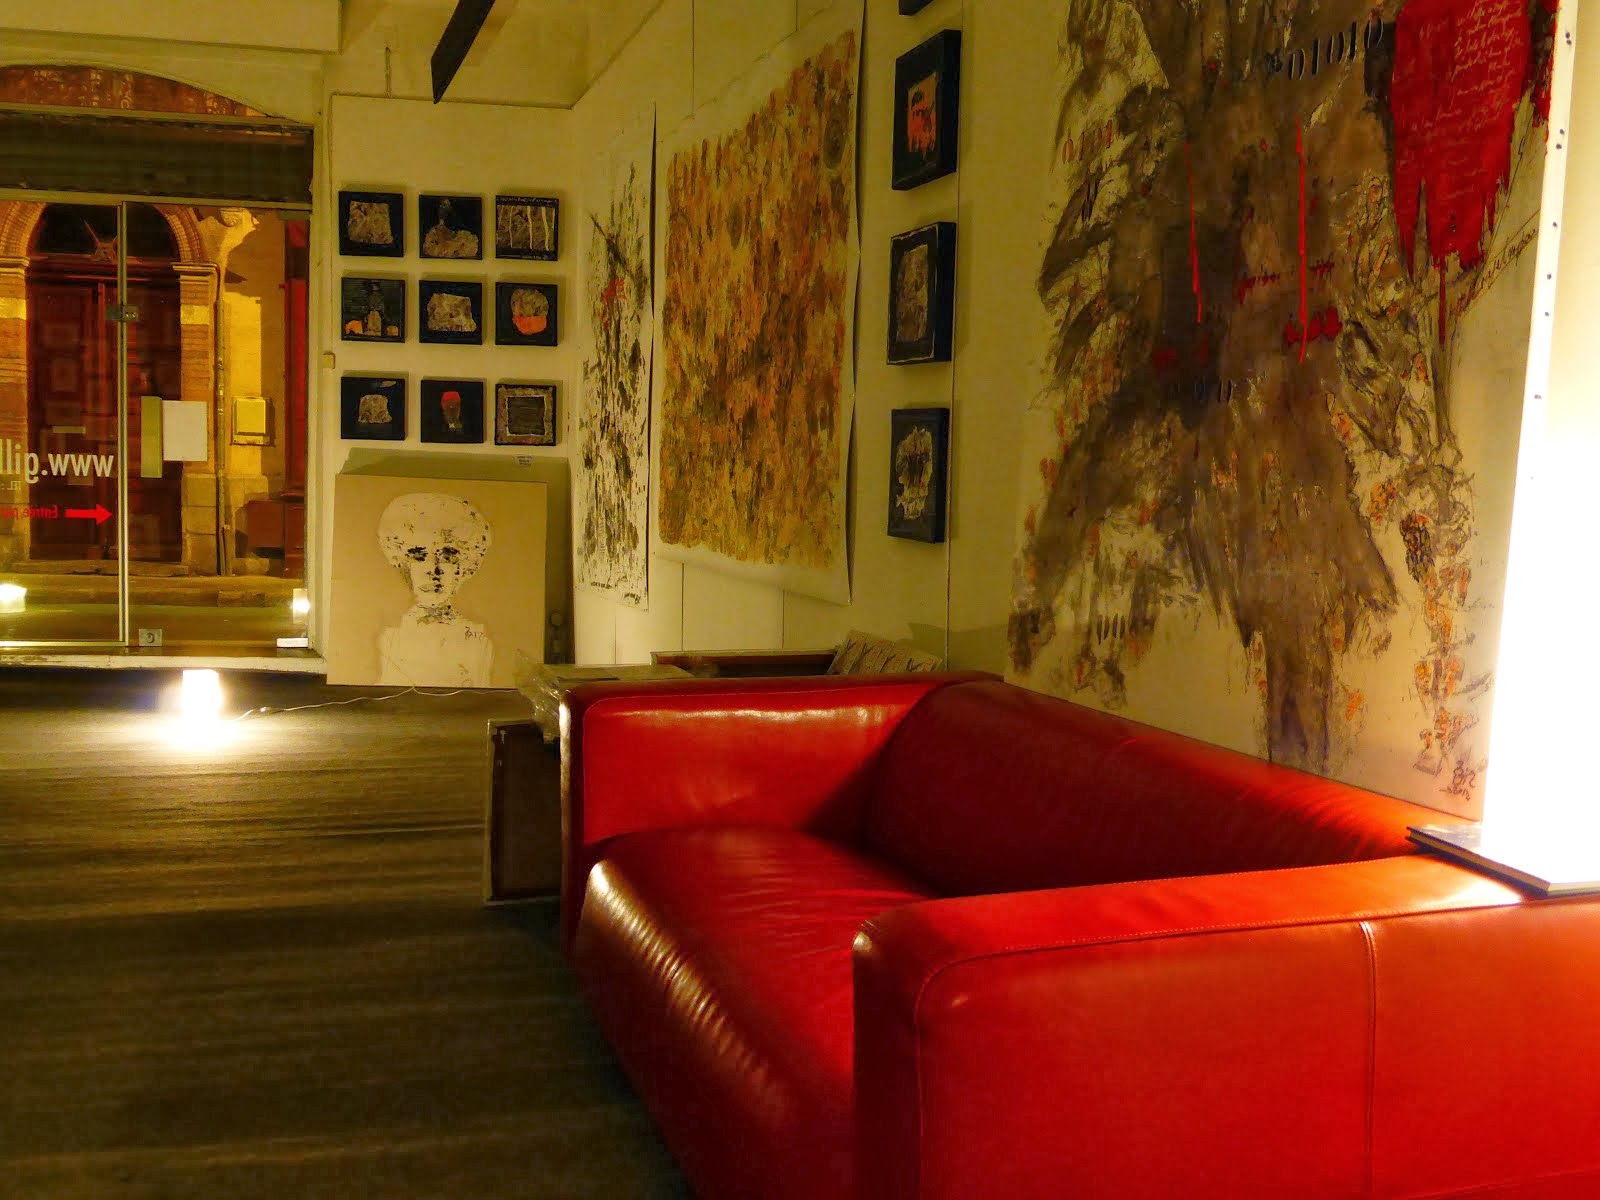 my gallery by night